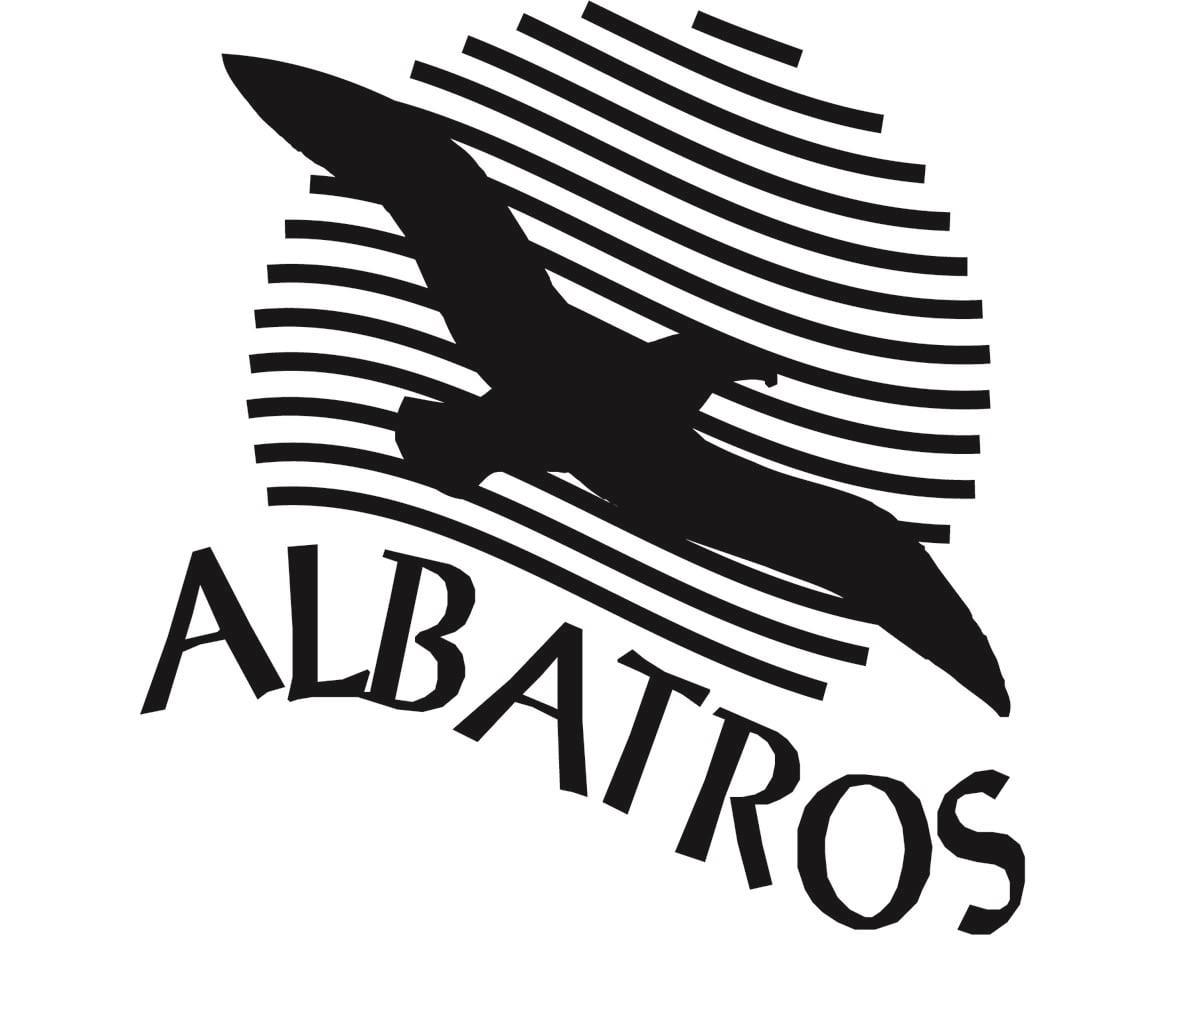 Calm - wydawnictwo albatros